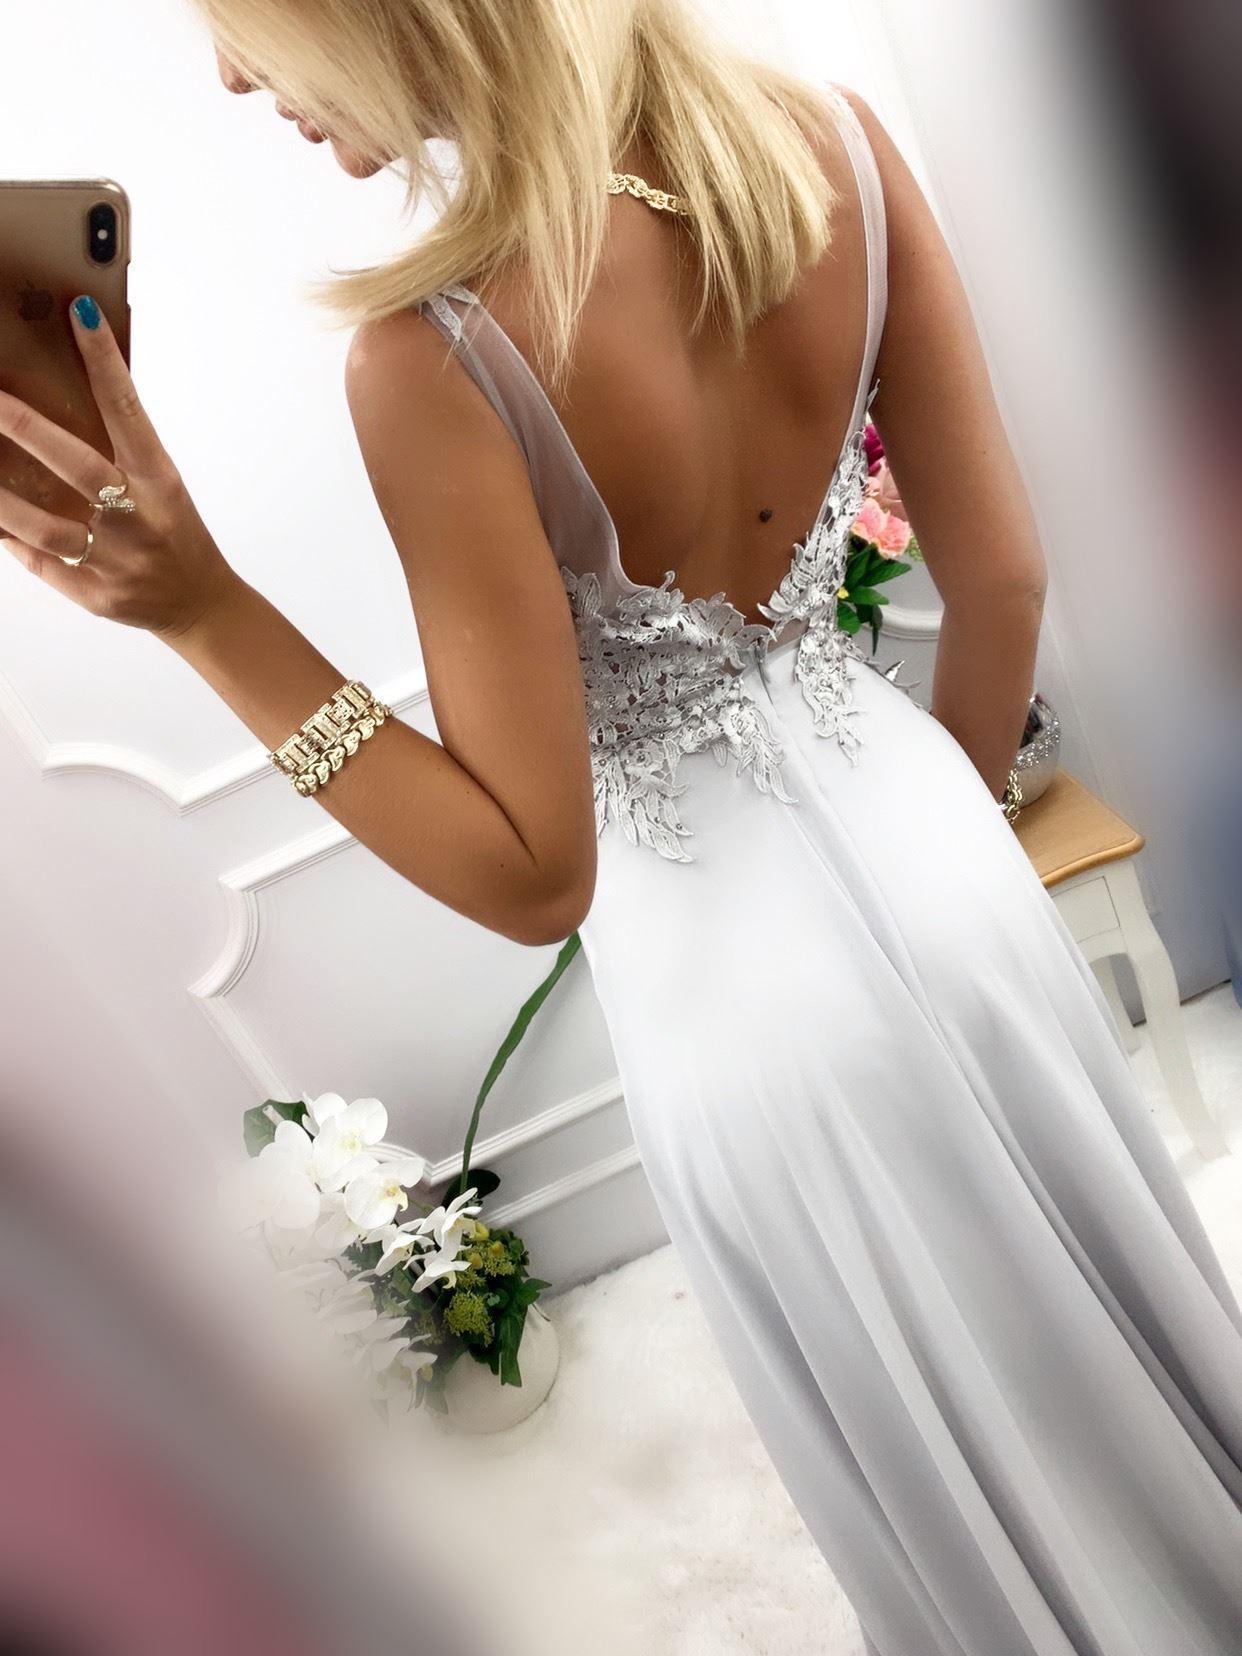 products 0003673 sukienka loren dluga szara 1